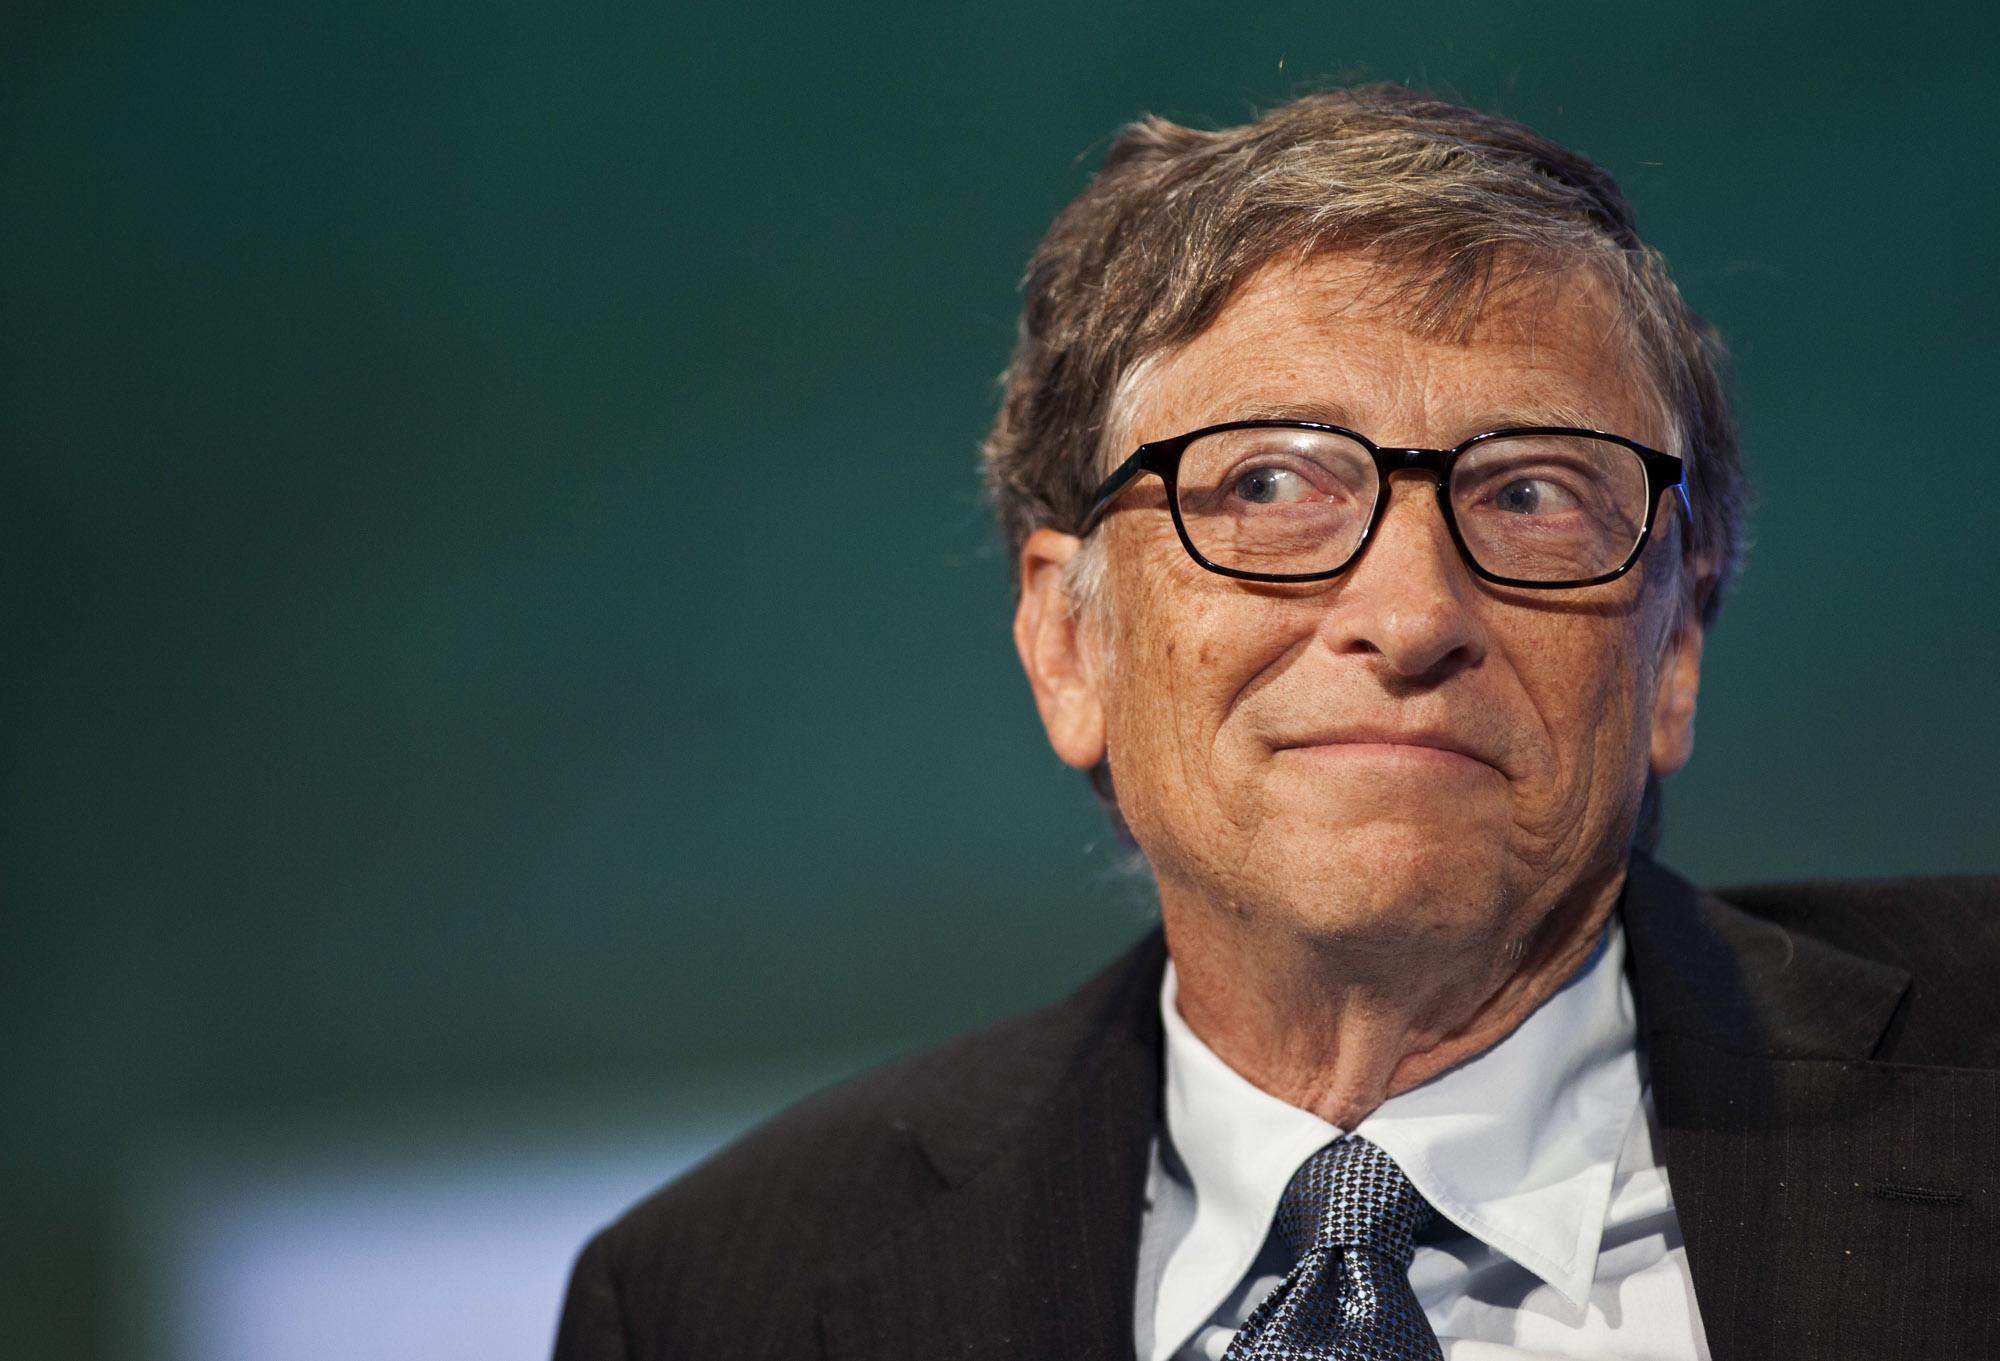 Билл Гейтс стал владельцем Android-смартфона